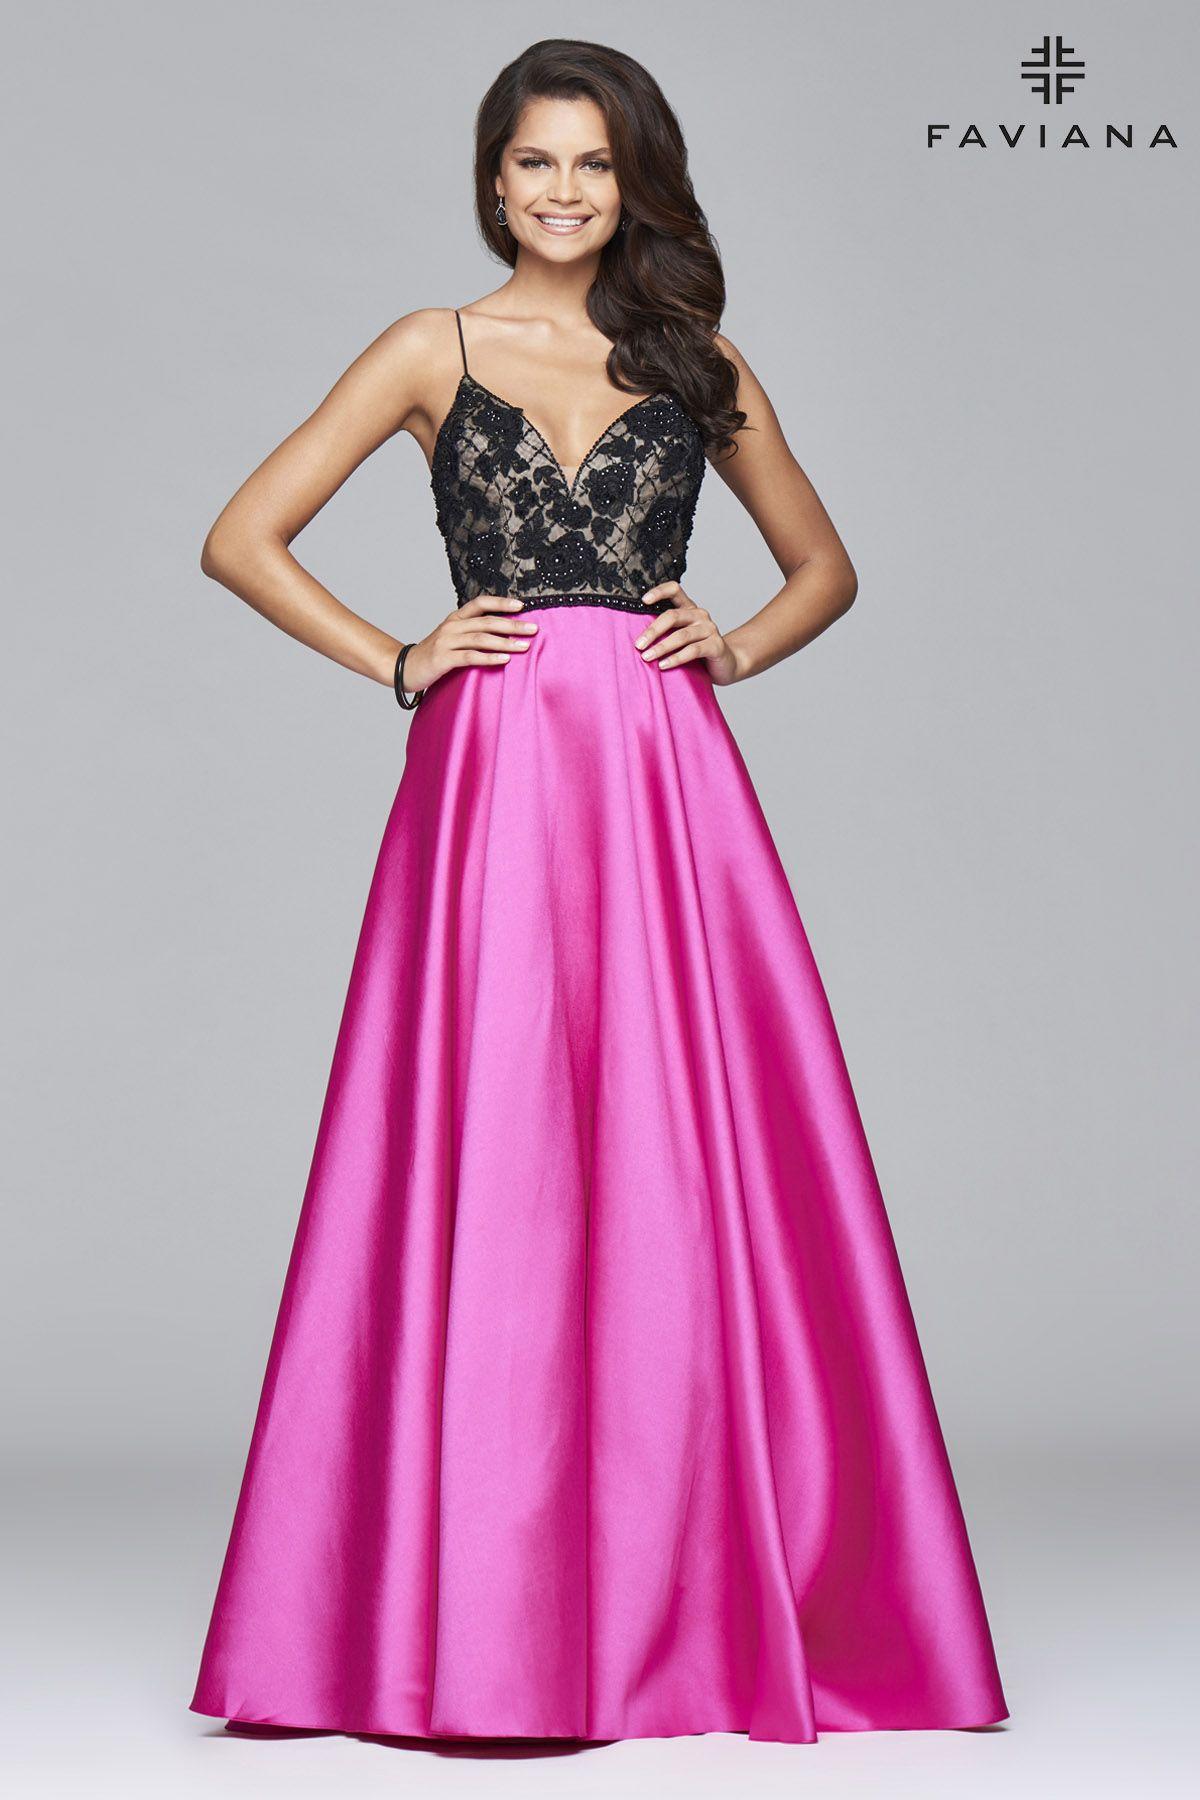 Faviana S7947 - International Prom Association | Faviana Prom ...